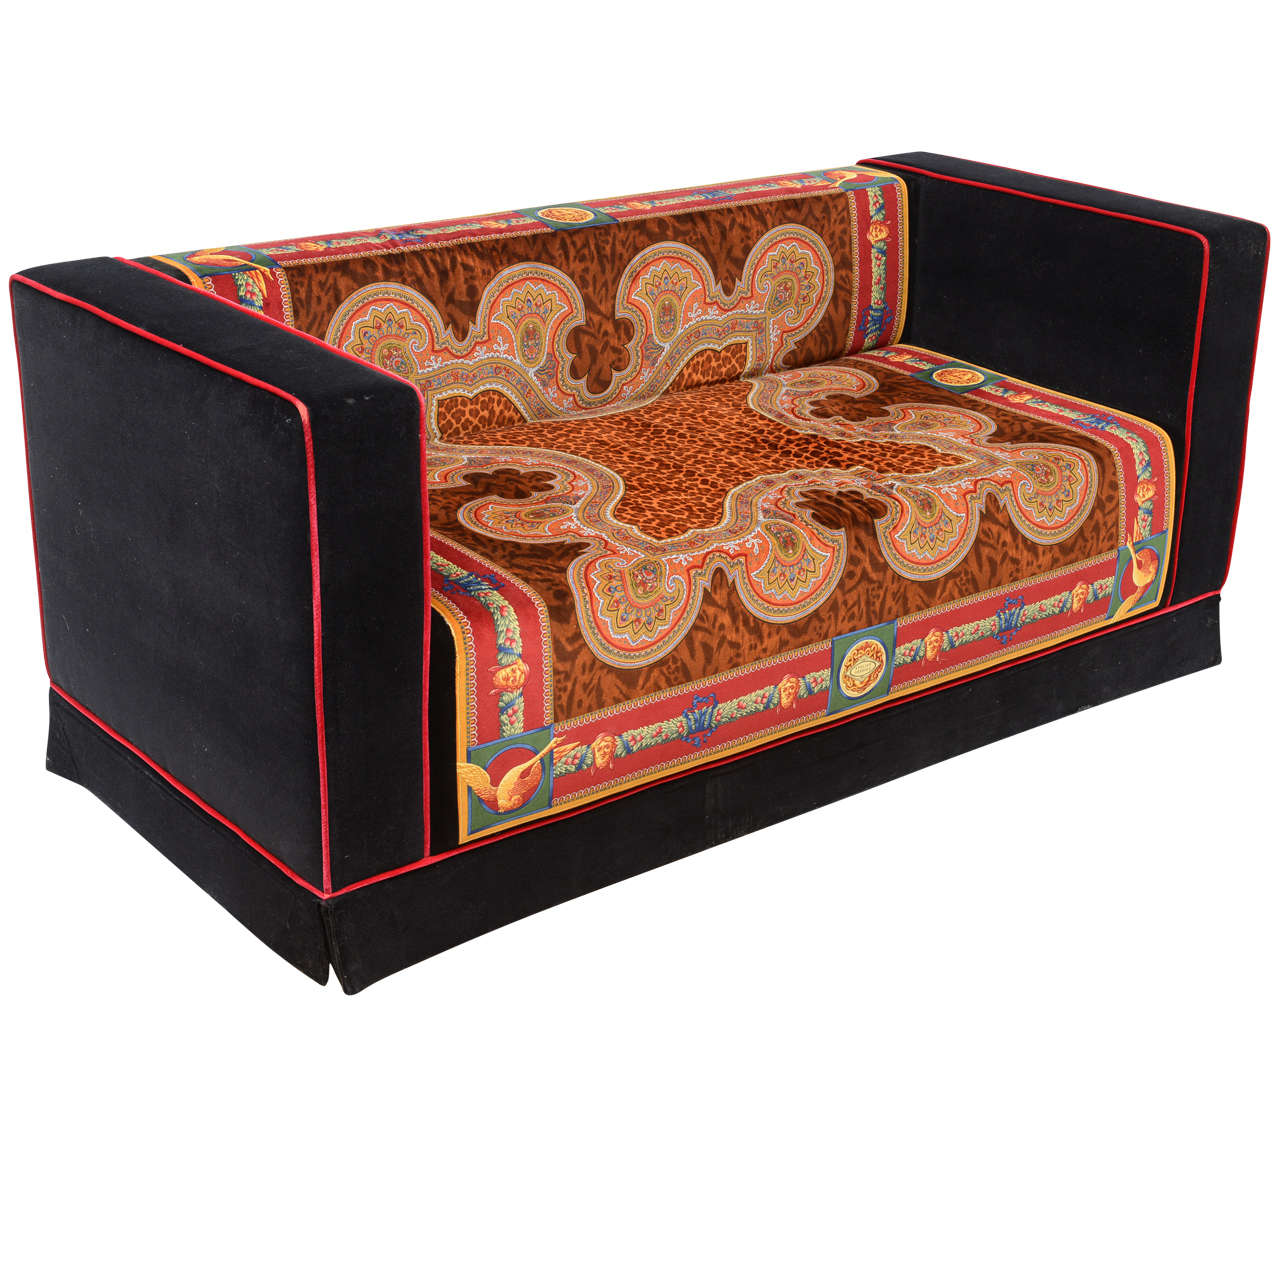 Versace Divan At Stdibs - Divan furniture